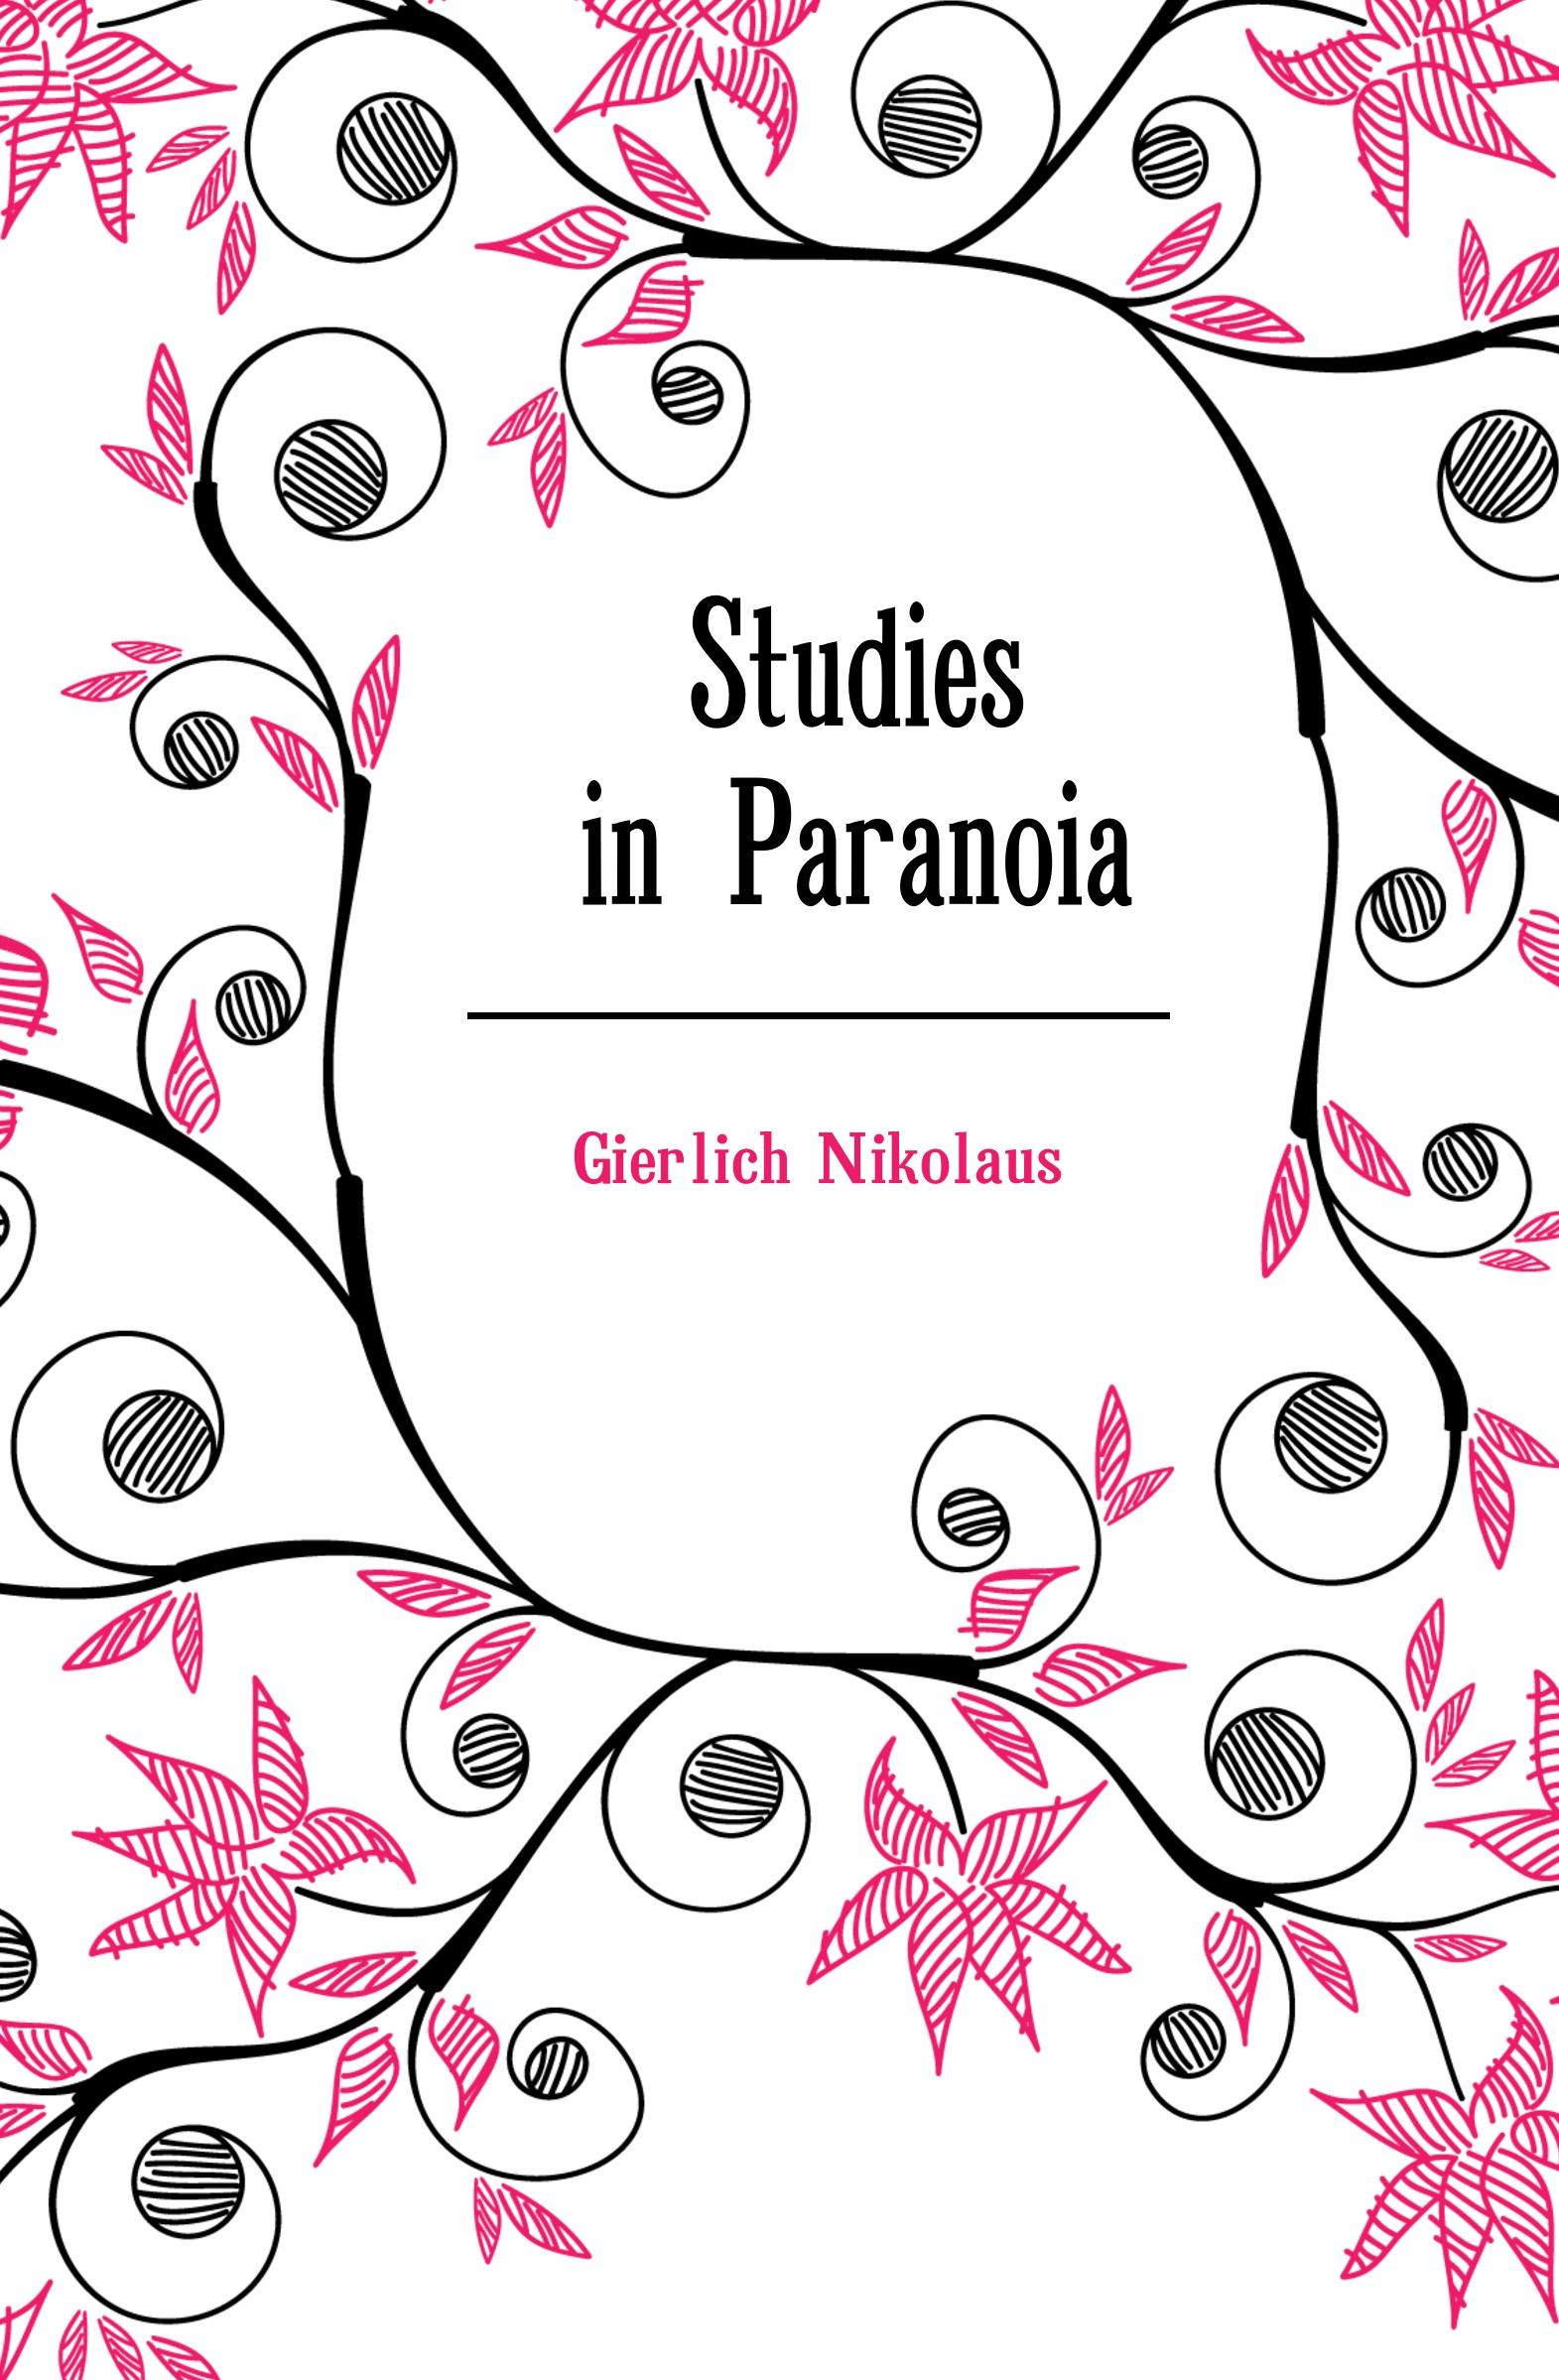 цена Gierlich Nikolaus Studies in Paranoia онлайн в 2017 году